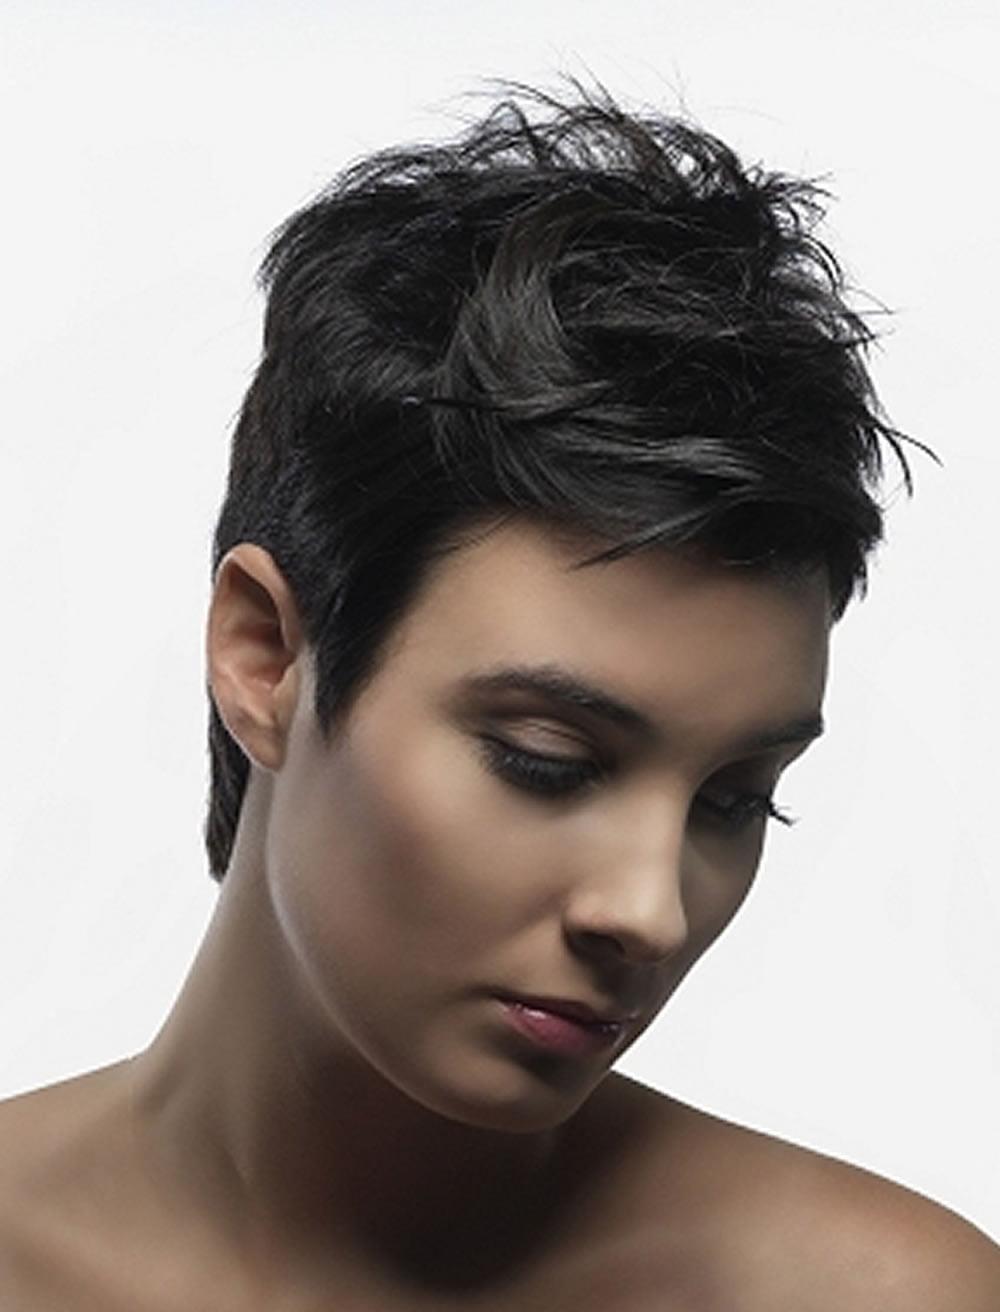 Best 24 Pixie Hair 2019 : Easy Short Haircut for Women - HAIRSTYLES